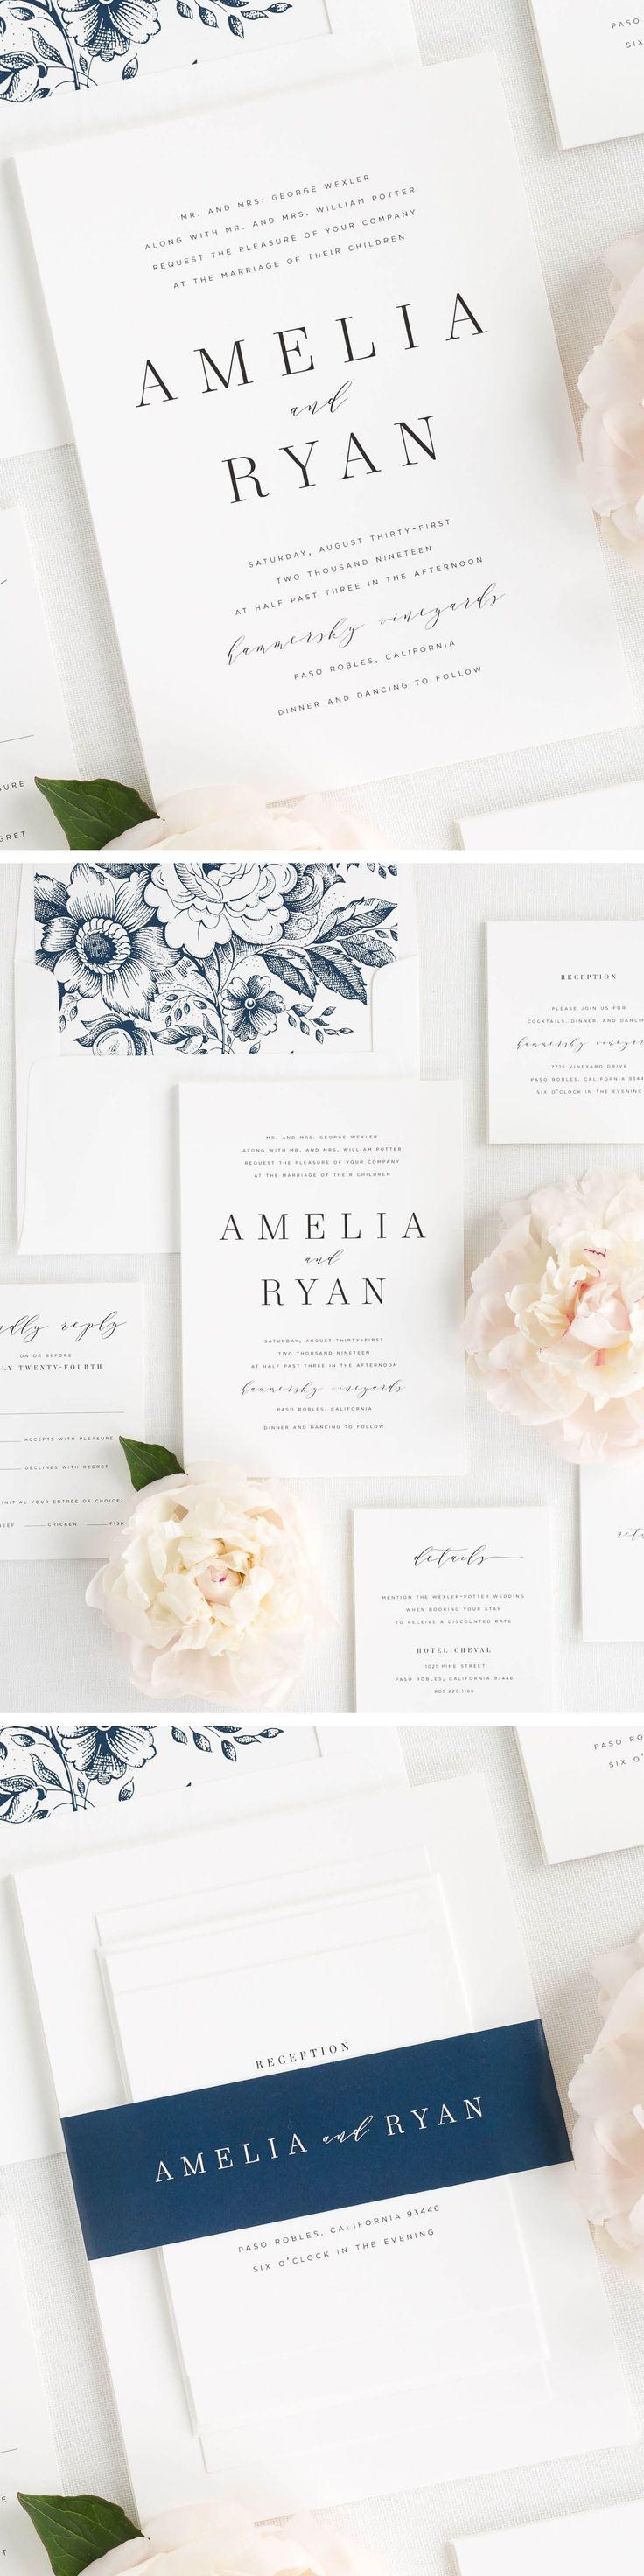 Best 25 Formal wedding envelope ideas ideas on Pinterest